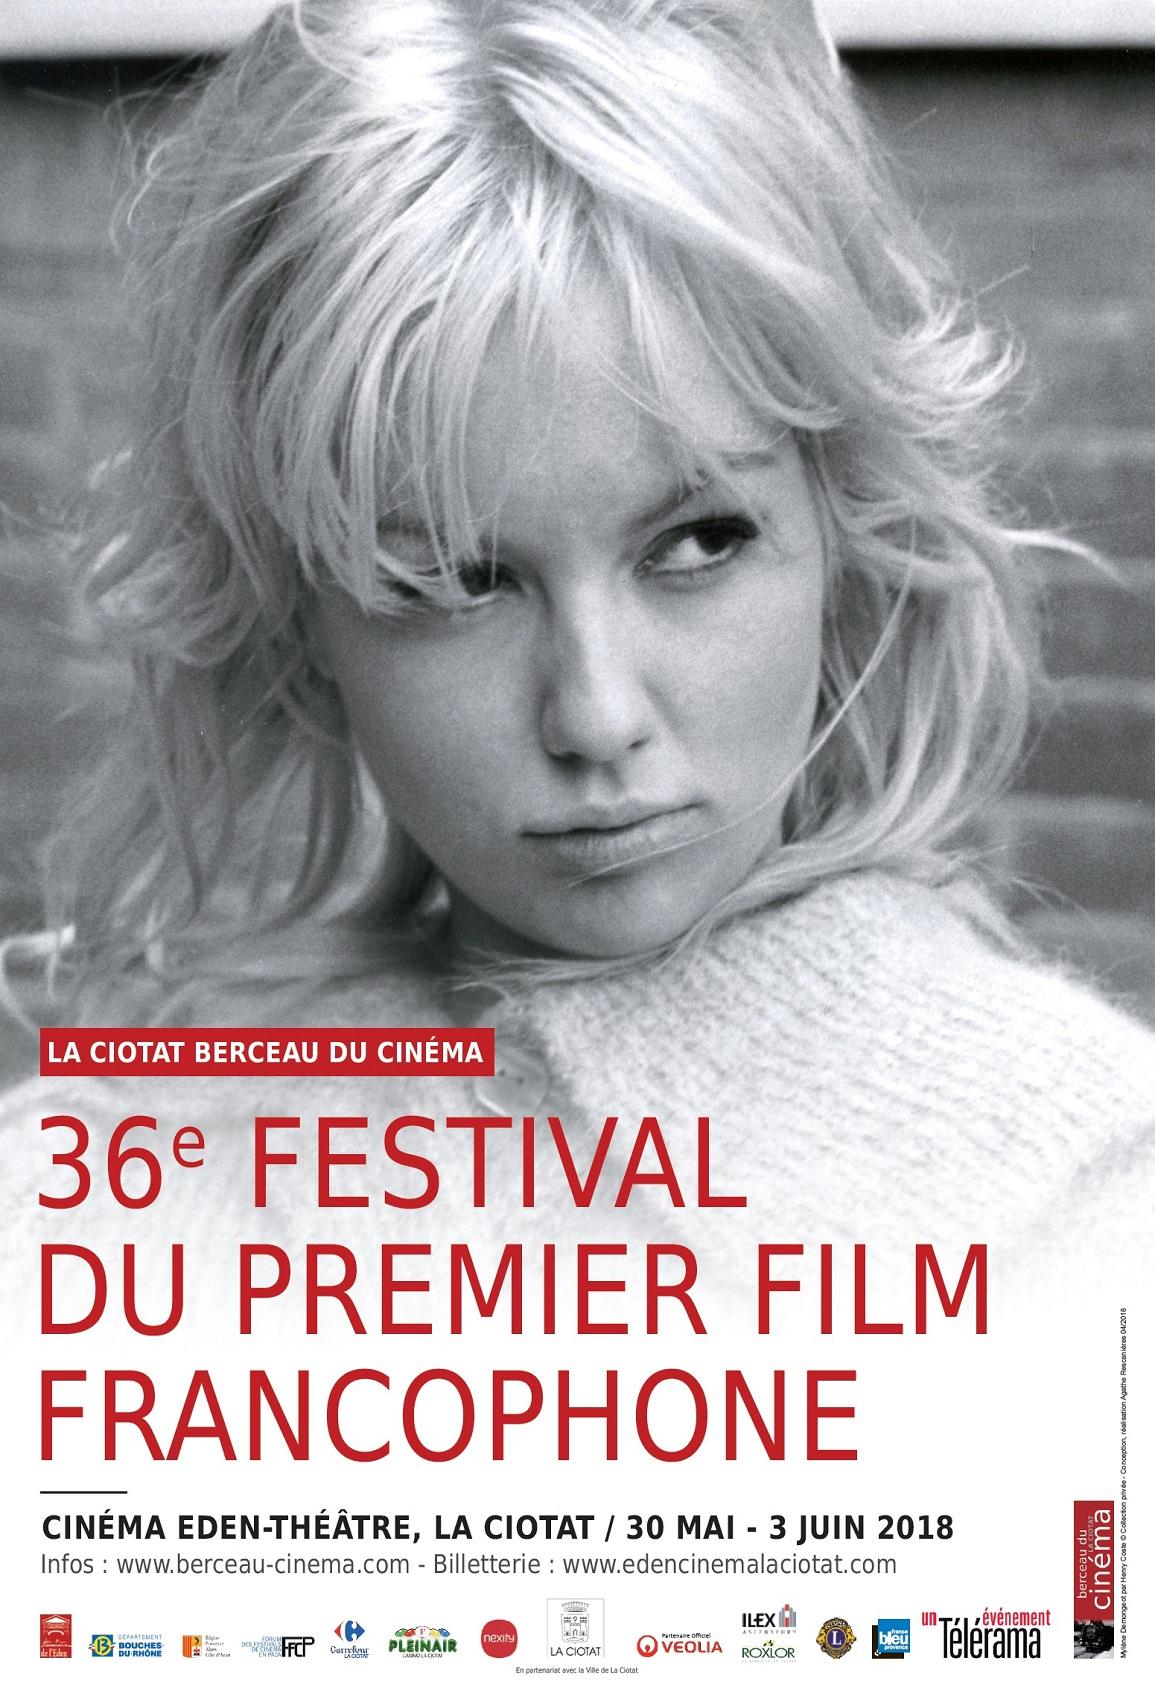 Affiche La Ciotat Berceau du cinema 2018